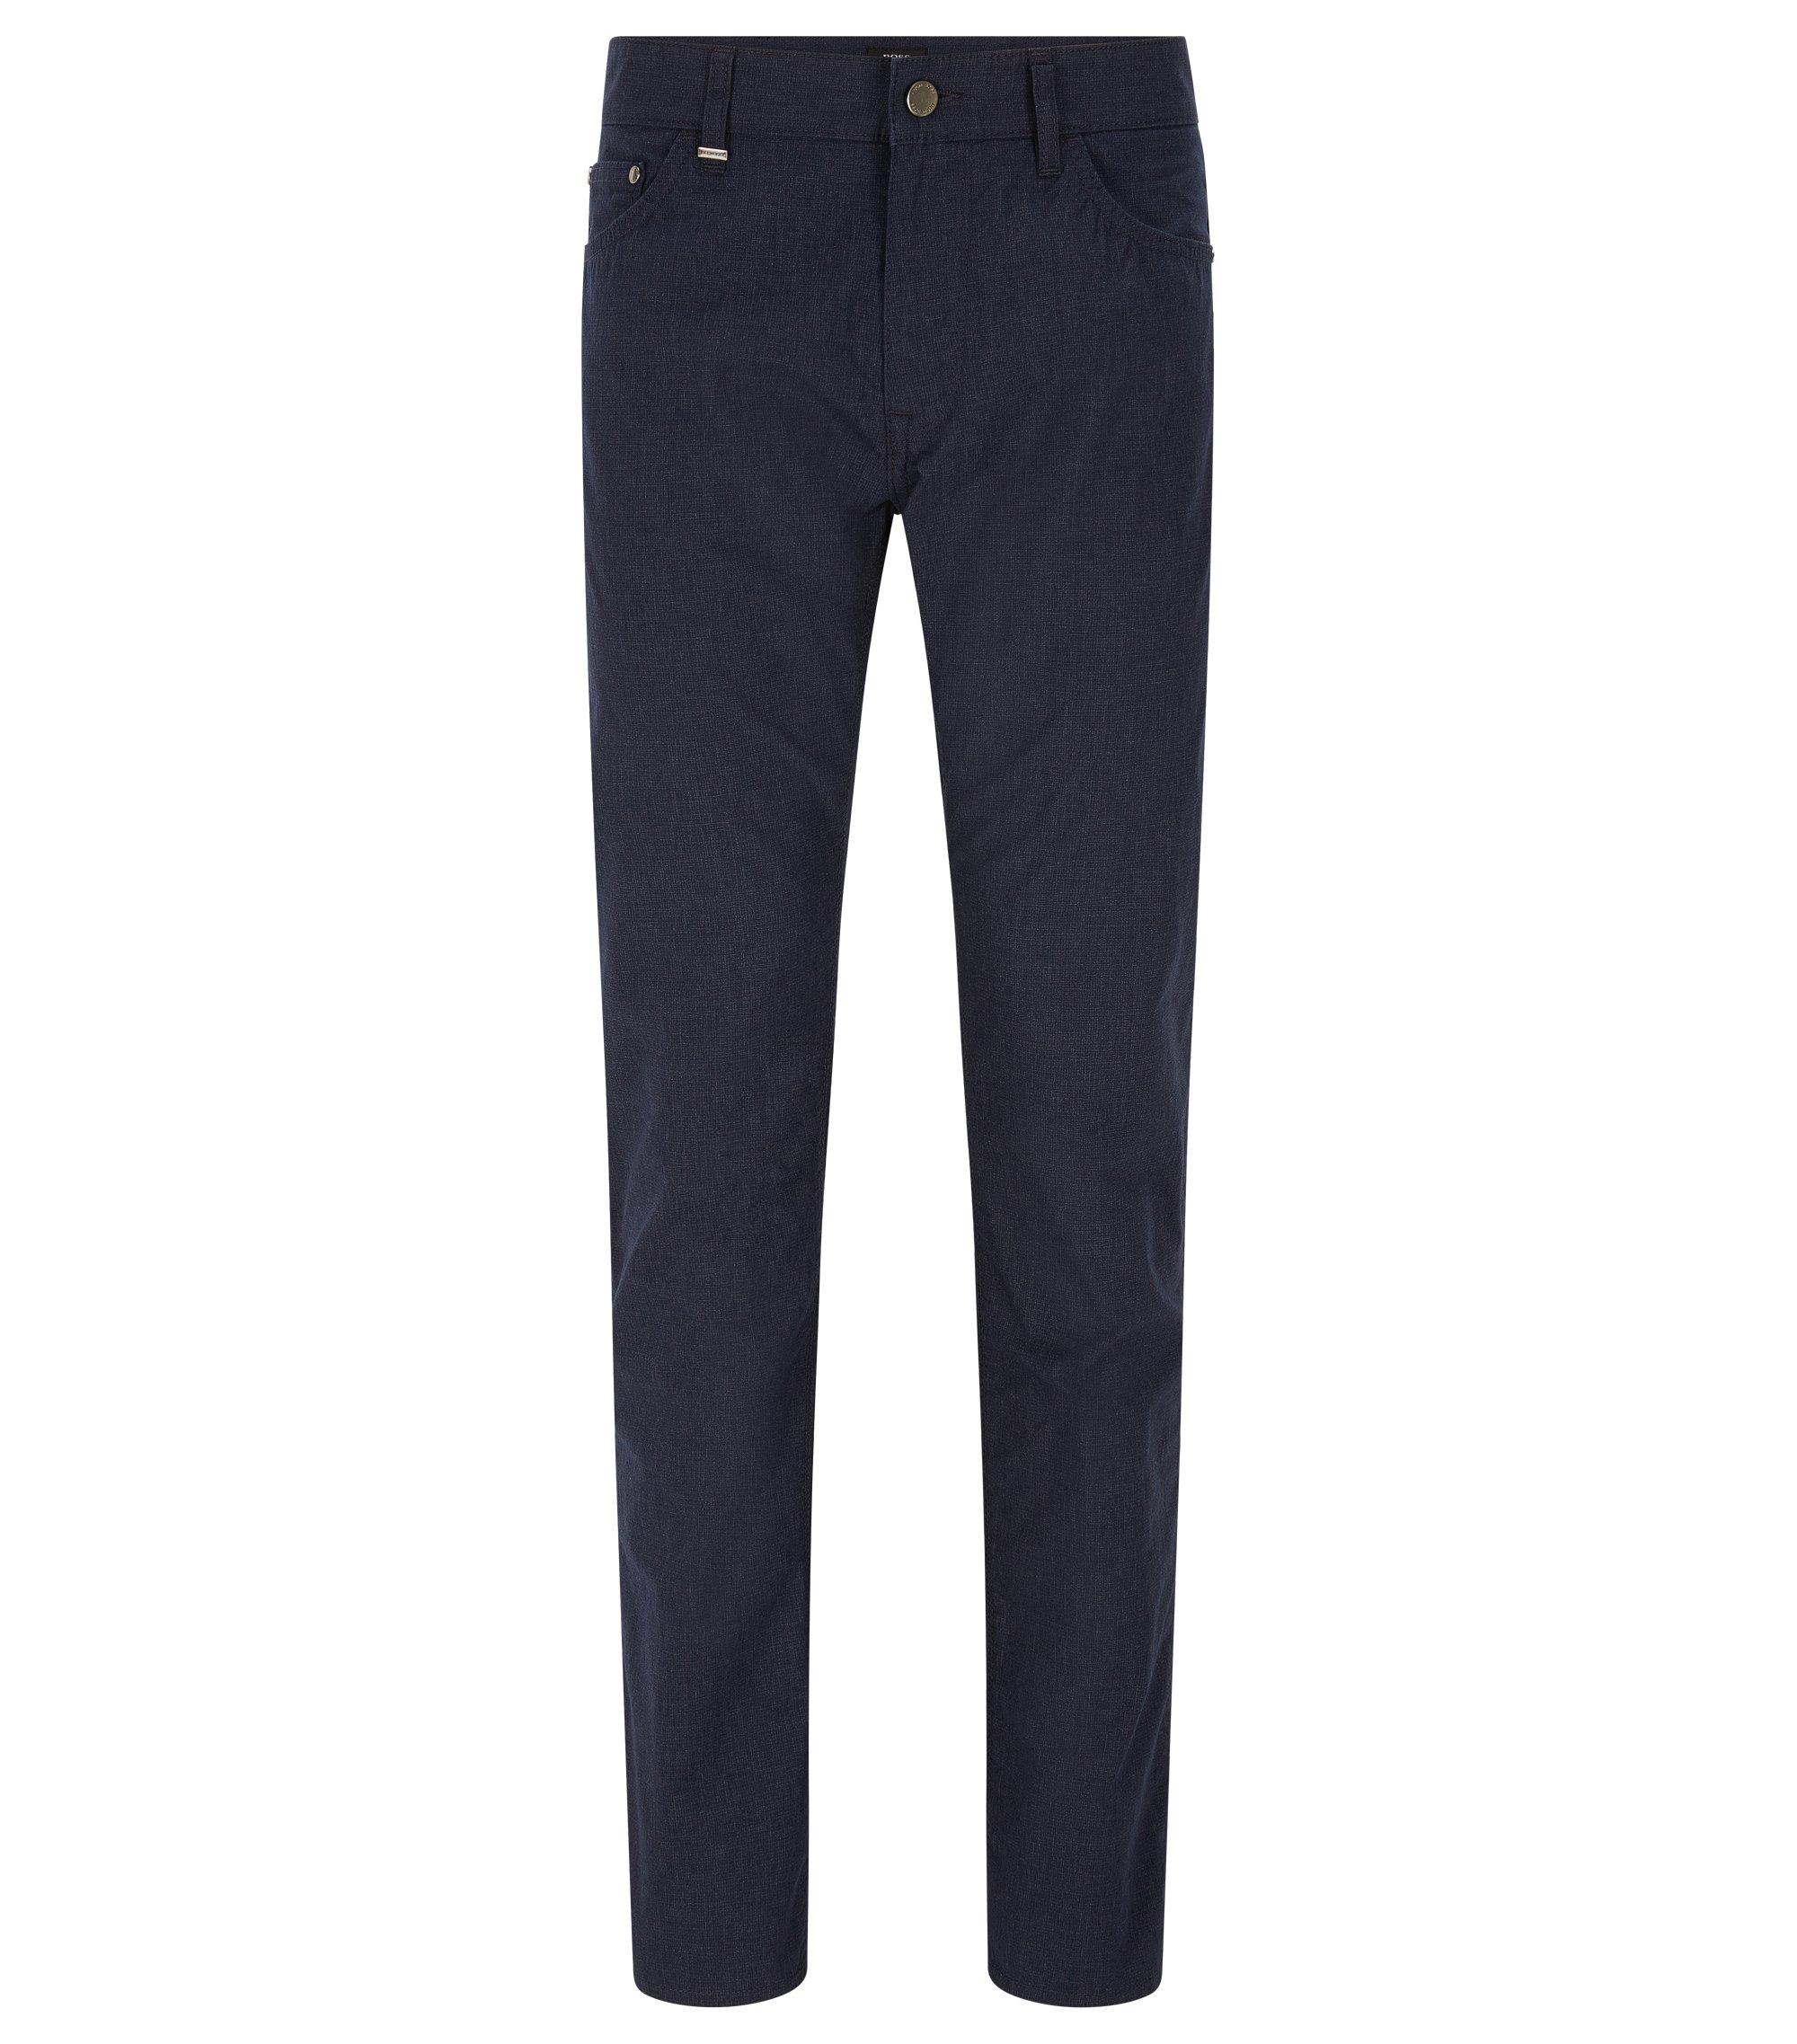 9 oz Basketweave Stretch Cotton Pant, Regular Fit | Maine, Dark Blue